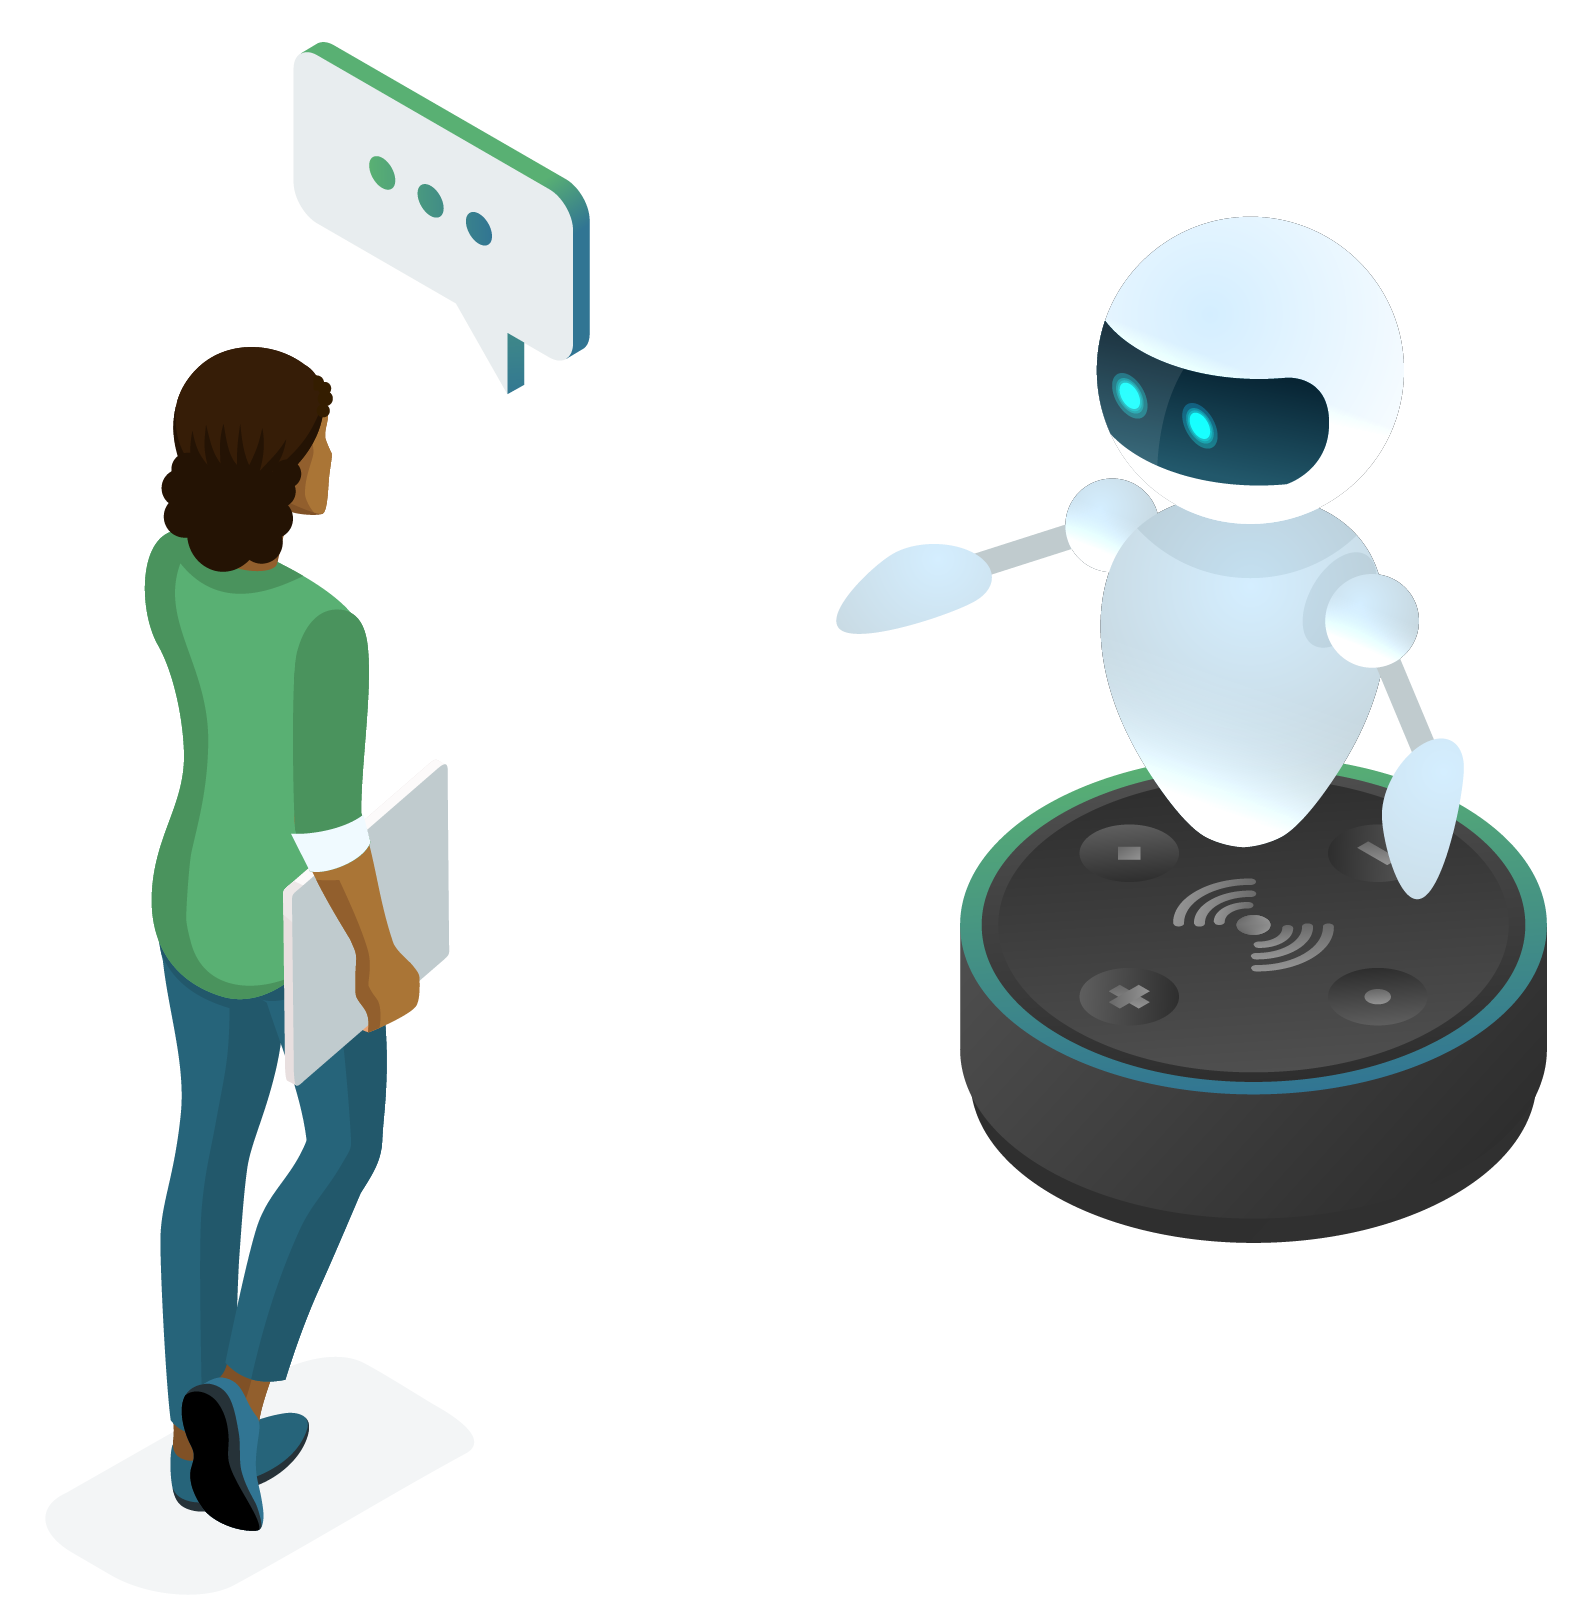 Oracle Digital Assistant